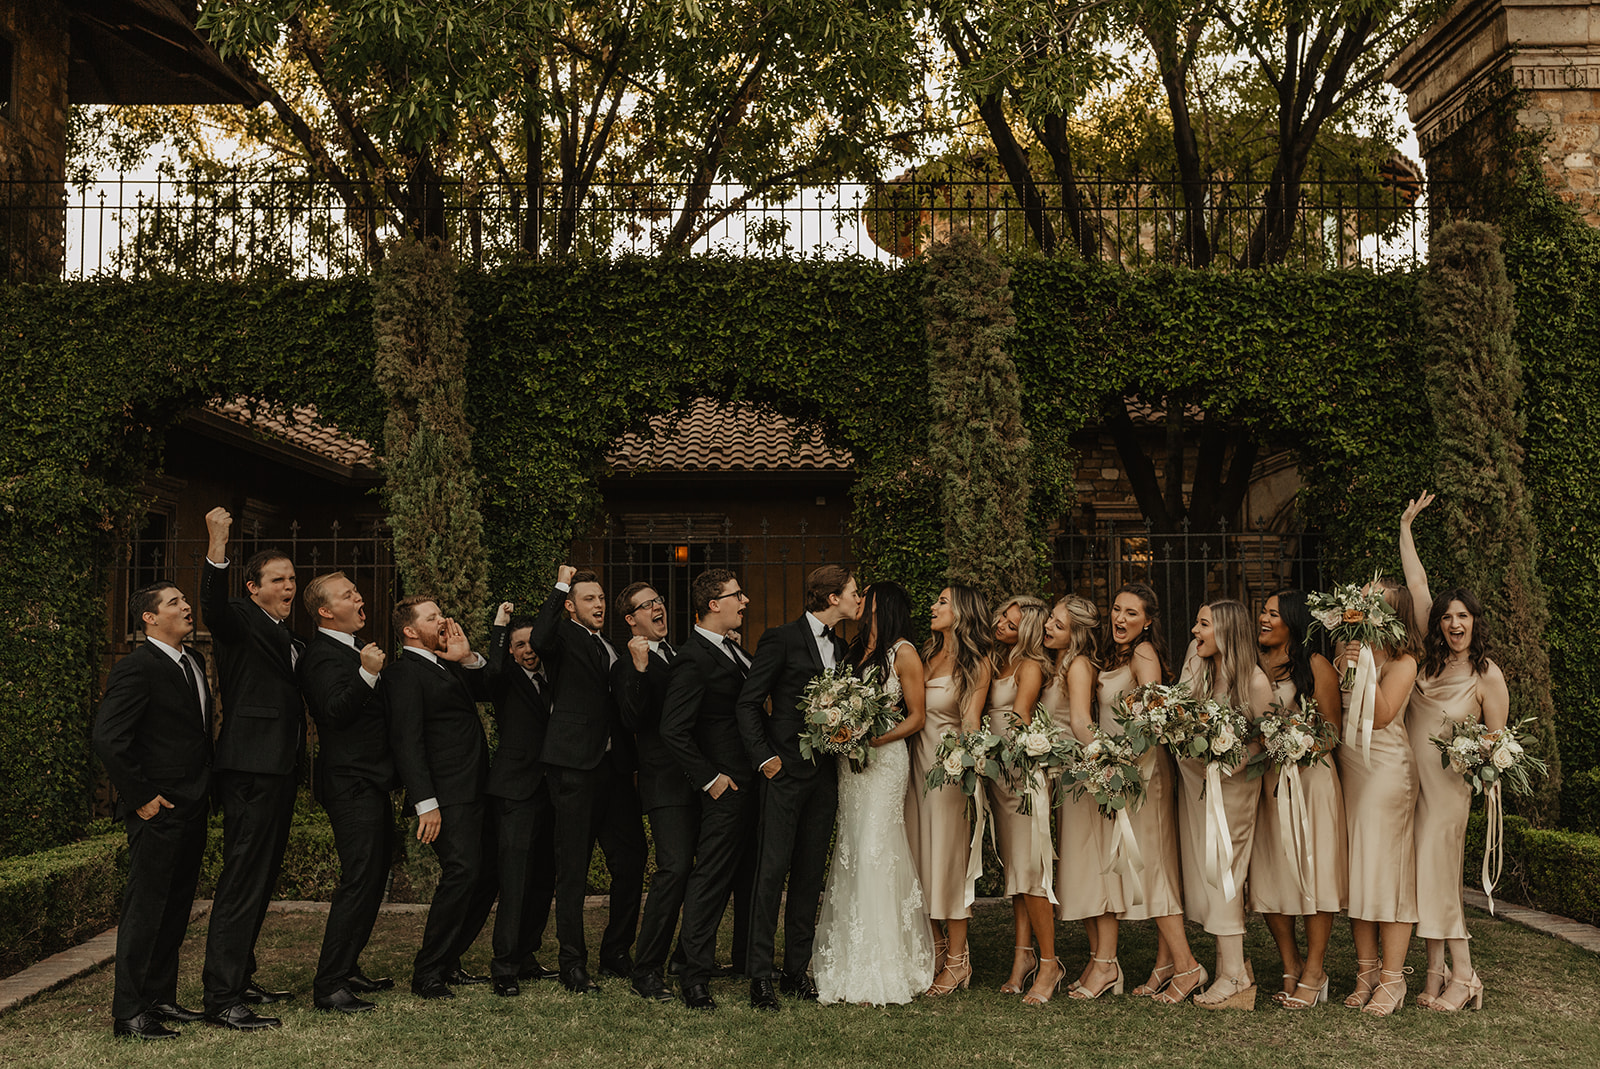 Joel and Mia - Real Weddings by The Groomsman Suit